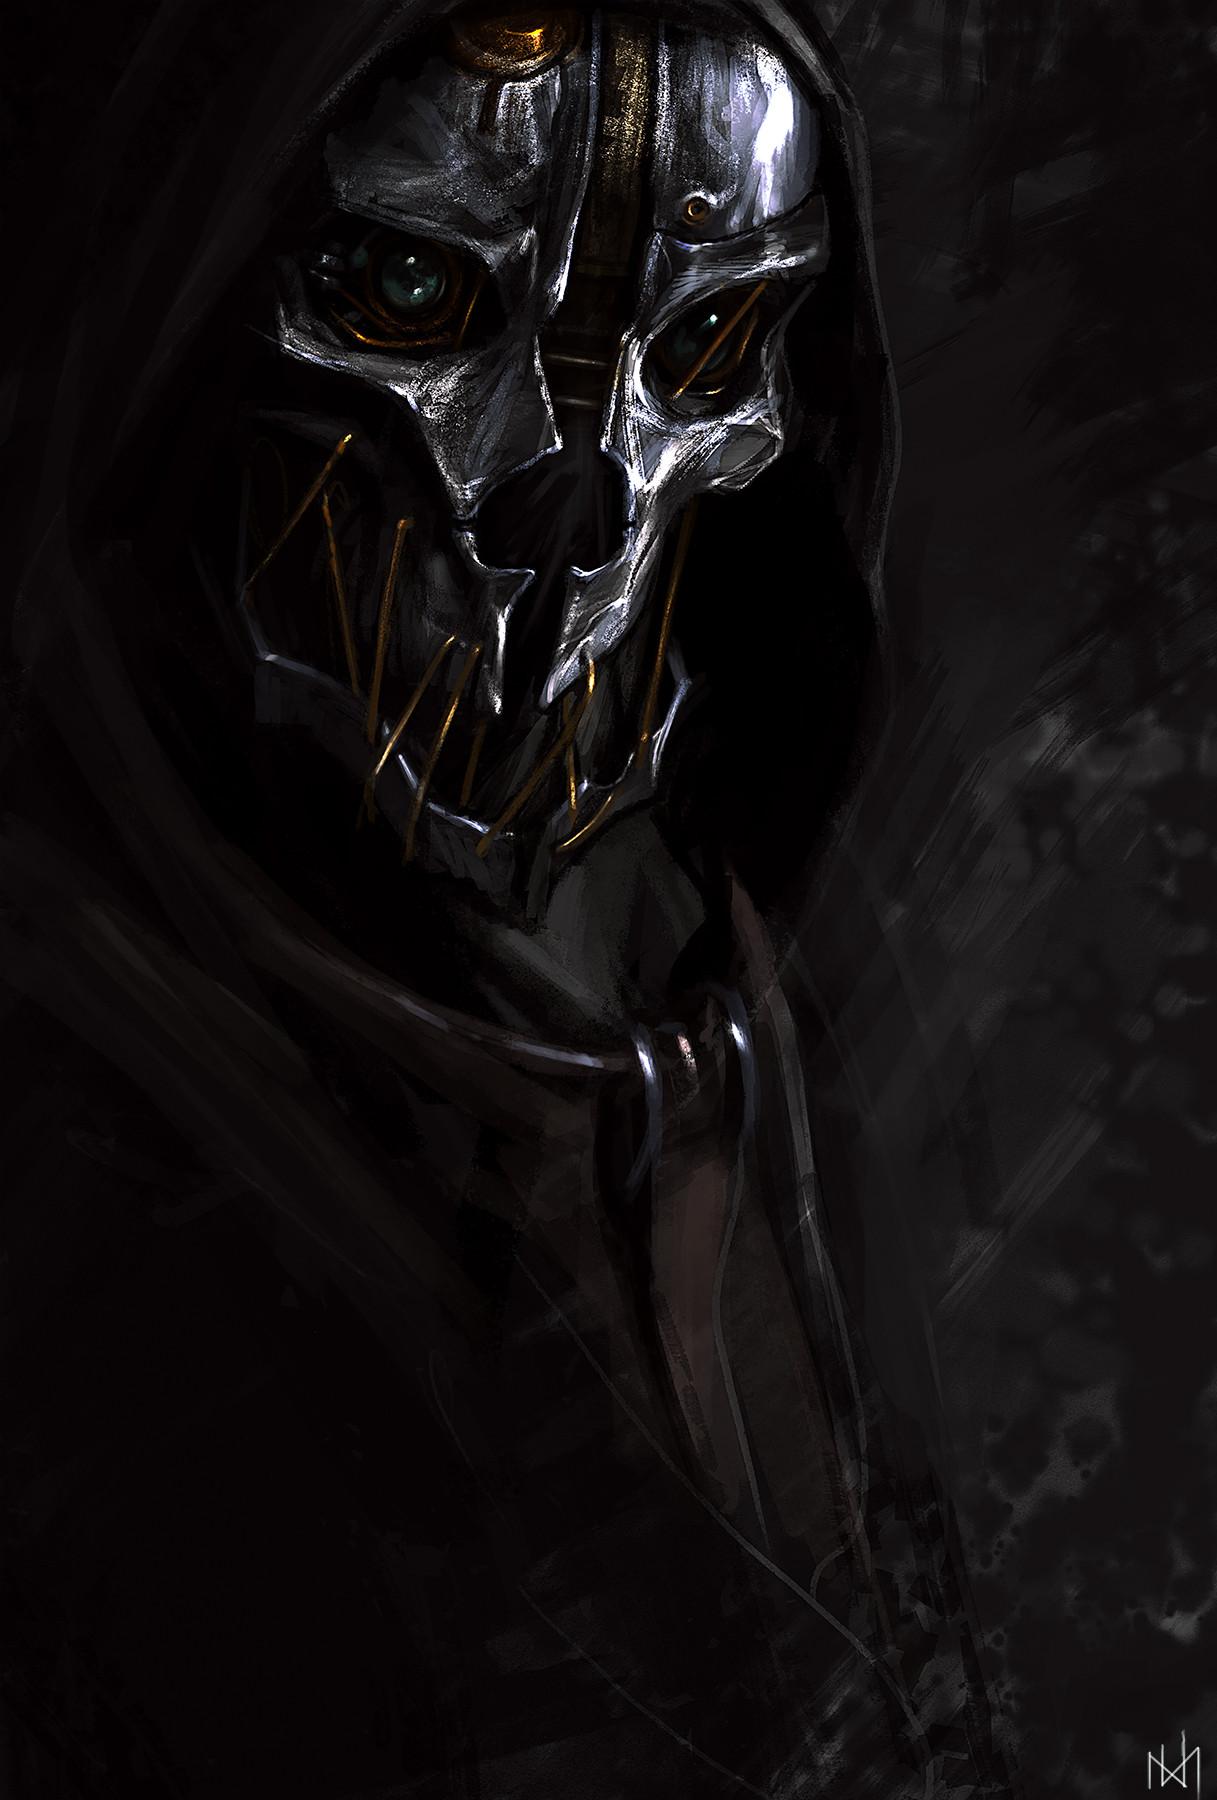 Nagy norbert dishonored corvo